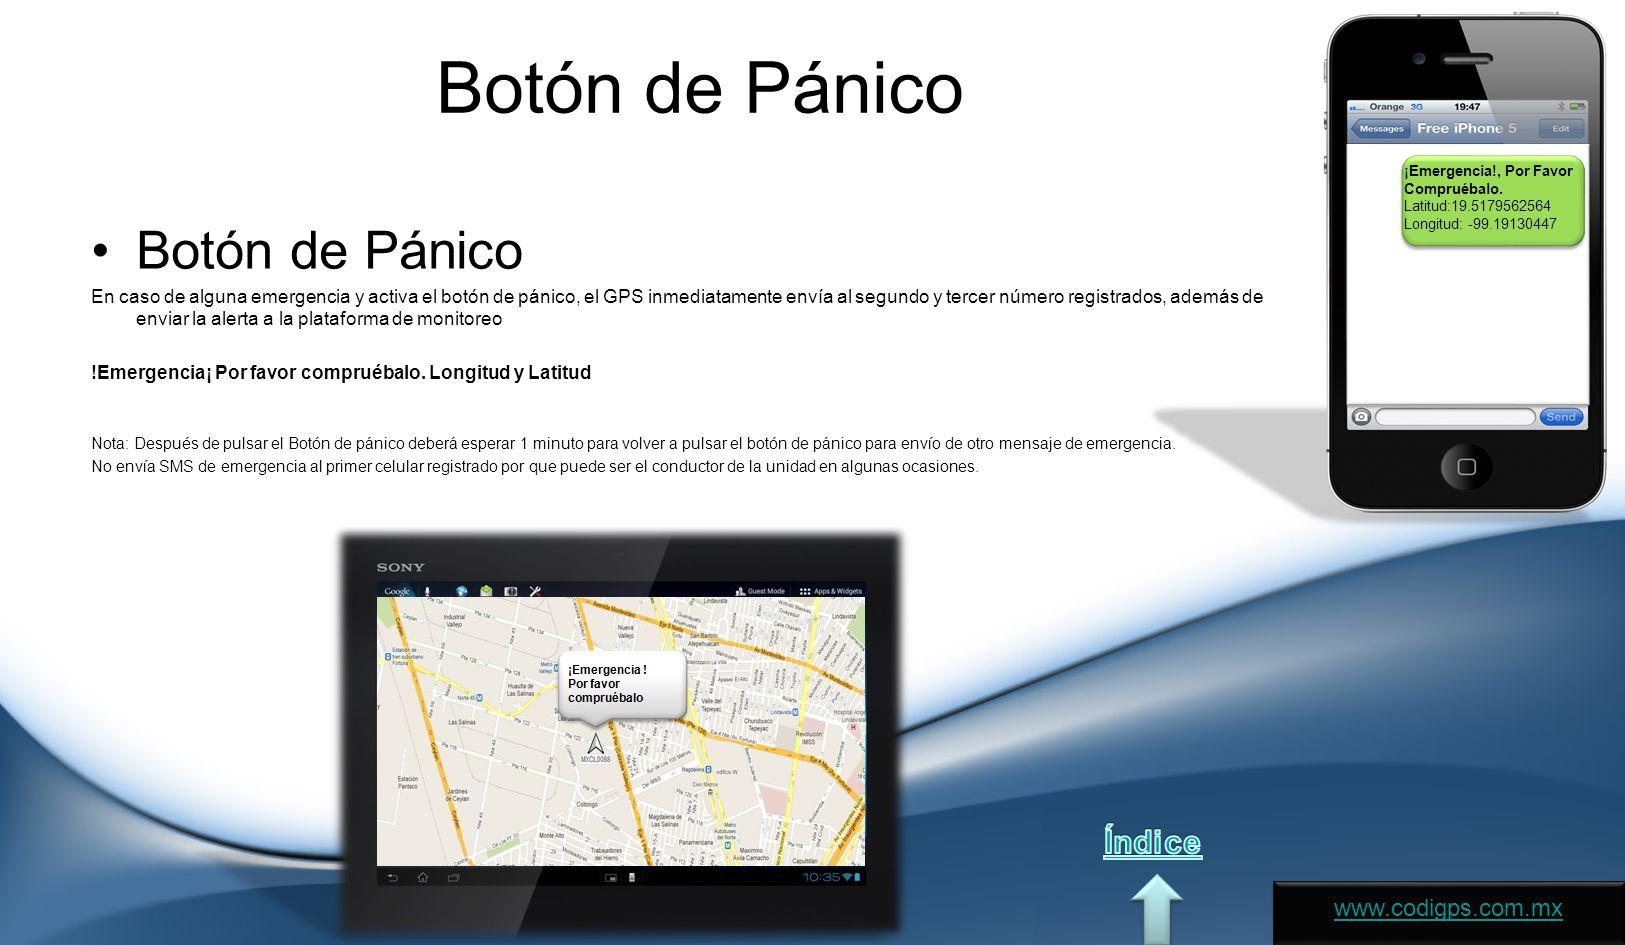 Botón de Pánico Botón de Pánico Índice www.codigps.com.mx